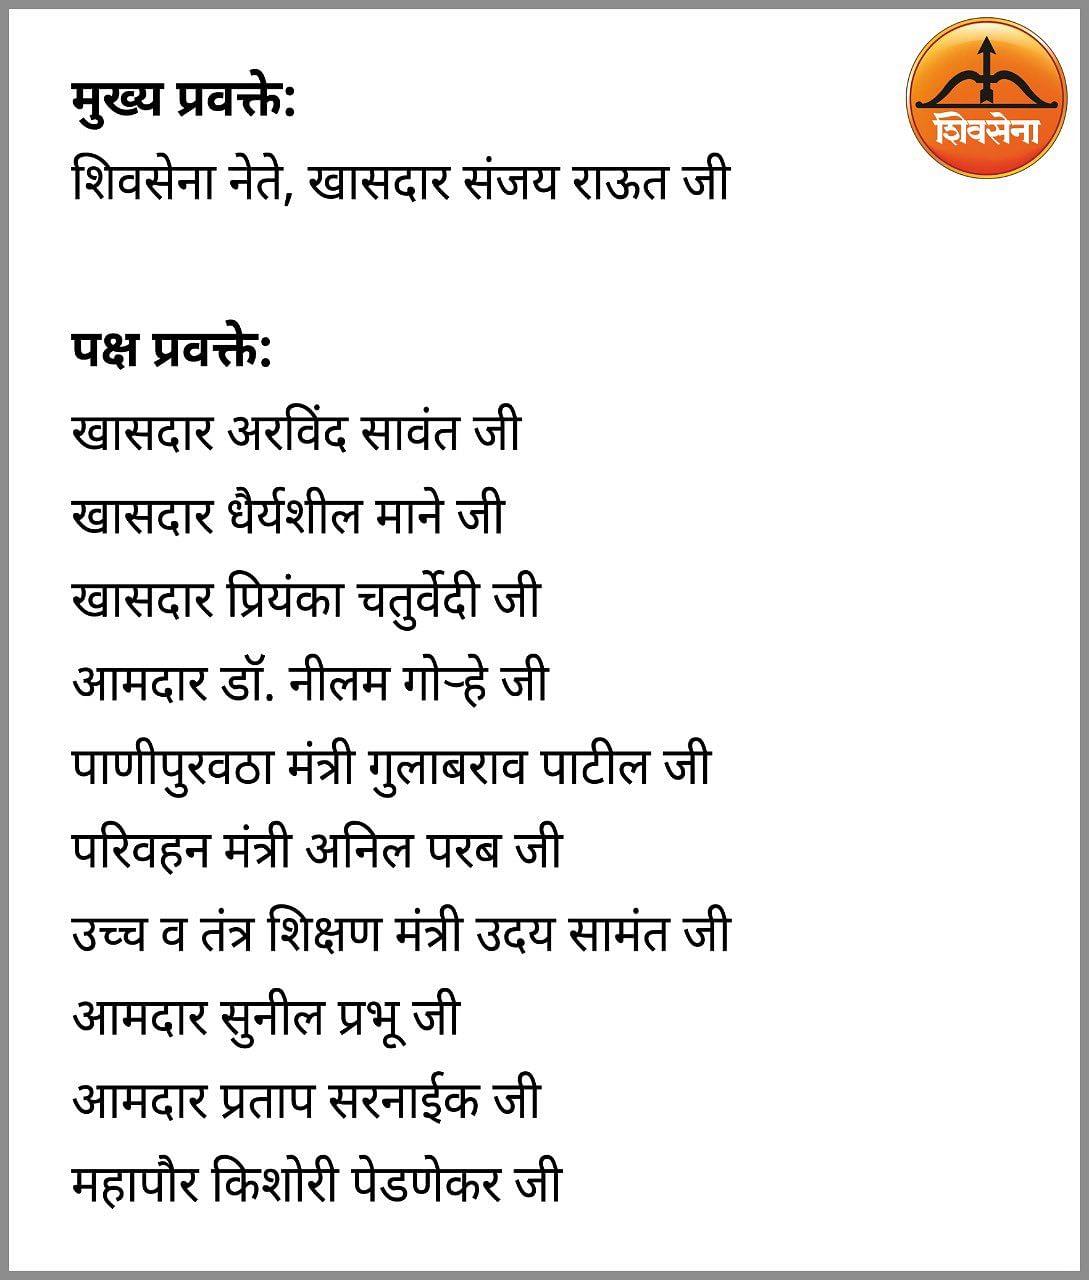 Check out the full list of Shiv Sena's spokesperson